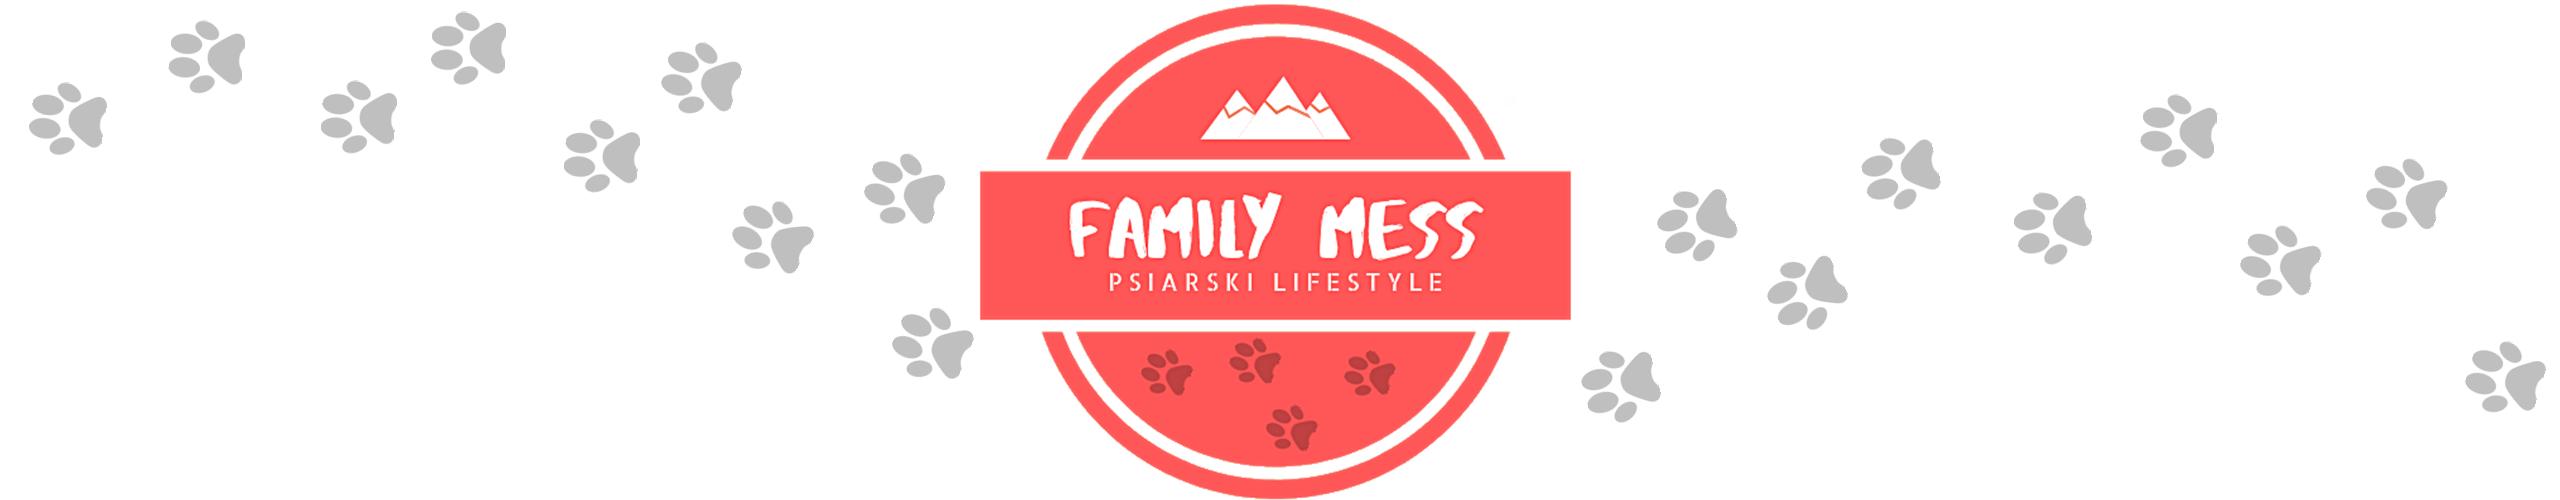 Family Mess